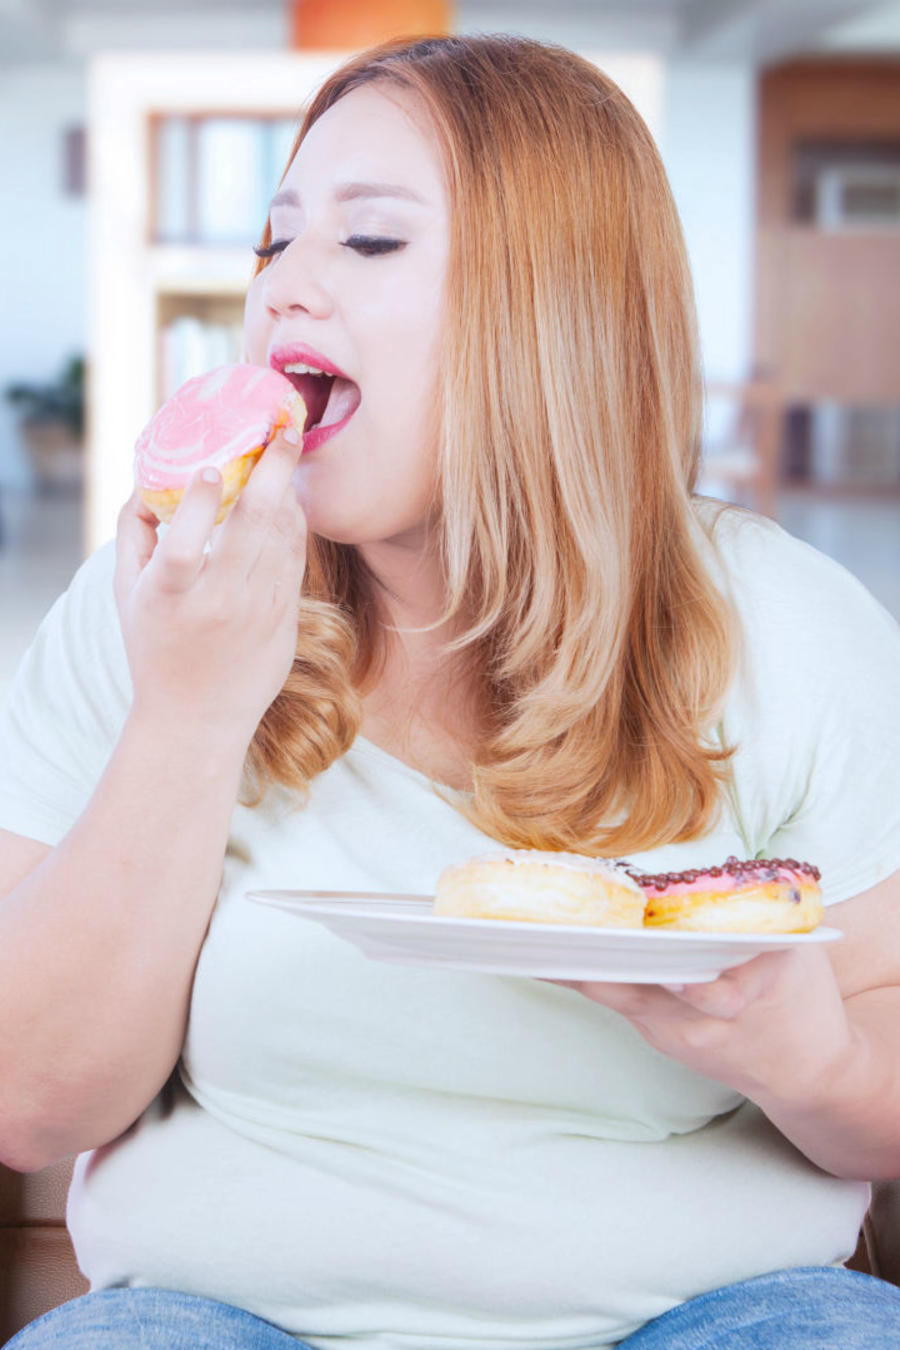 Mujer comiendo donas